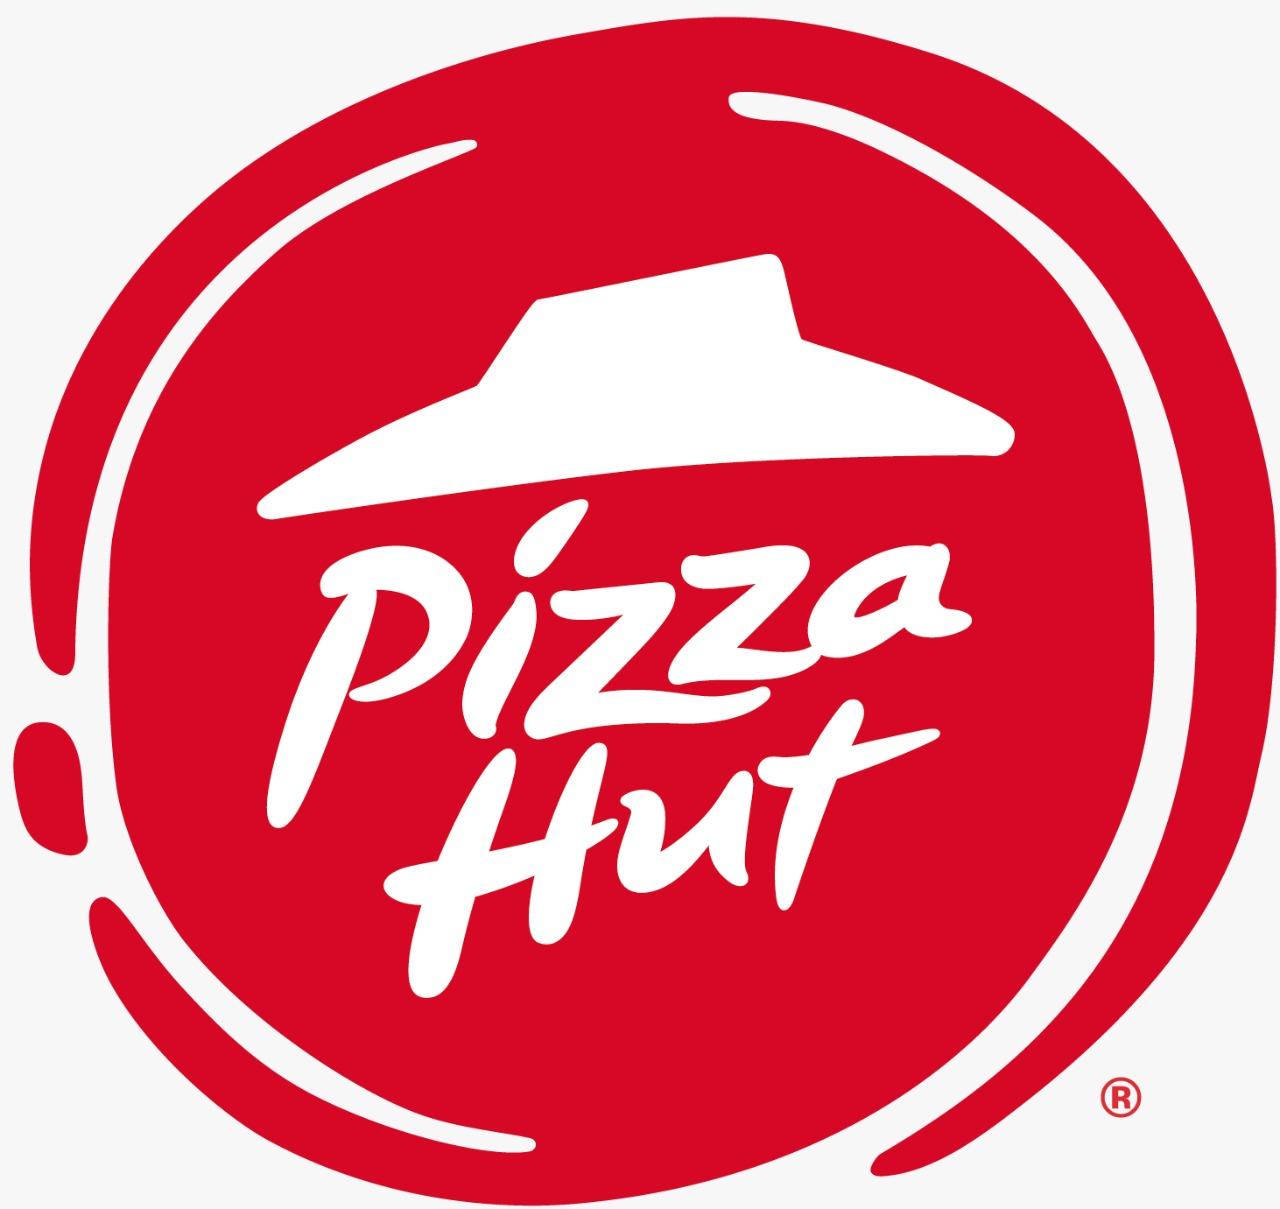 PIZZA HUT - SODETUR